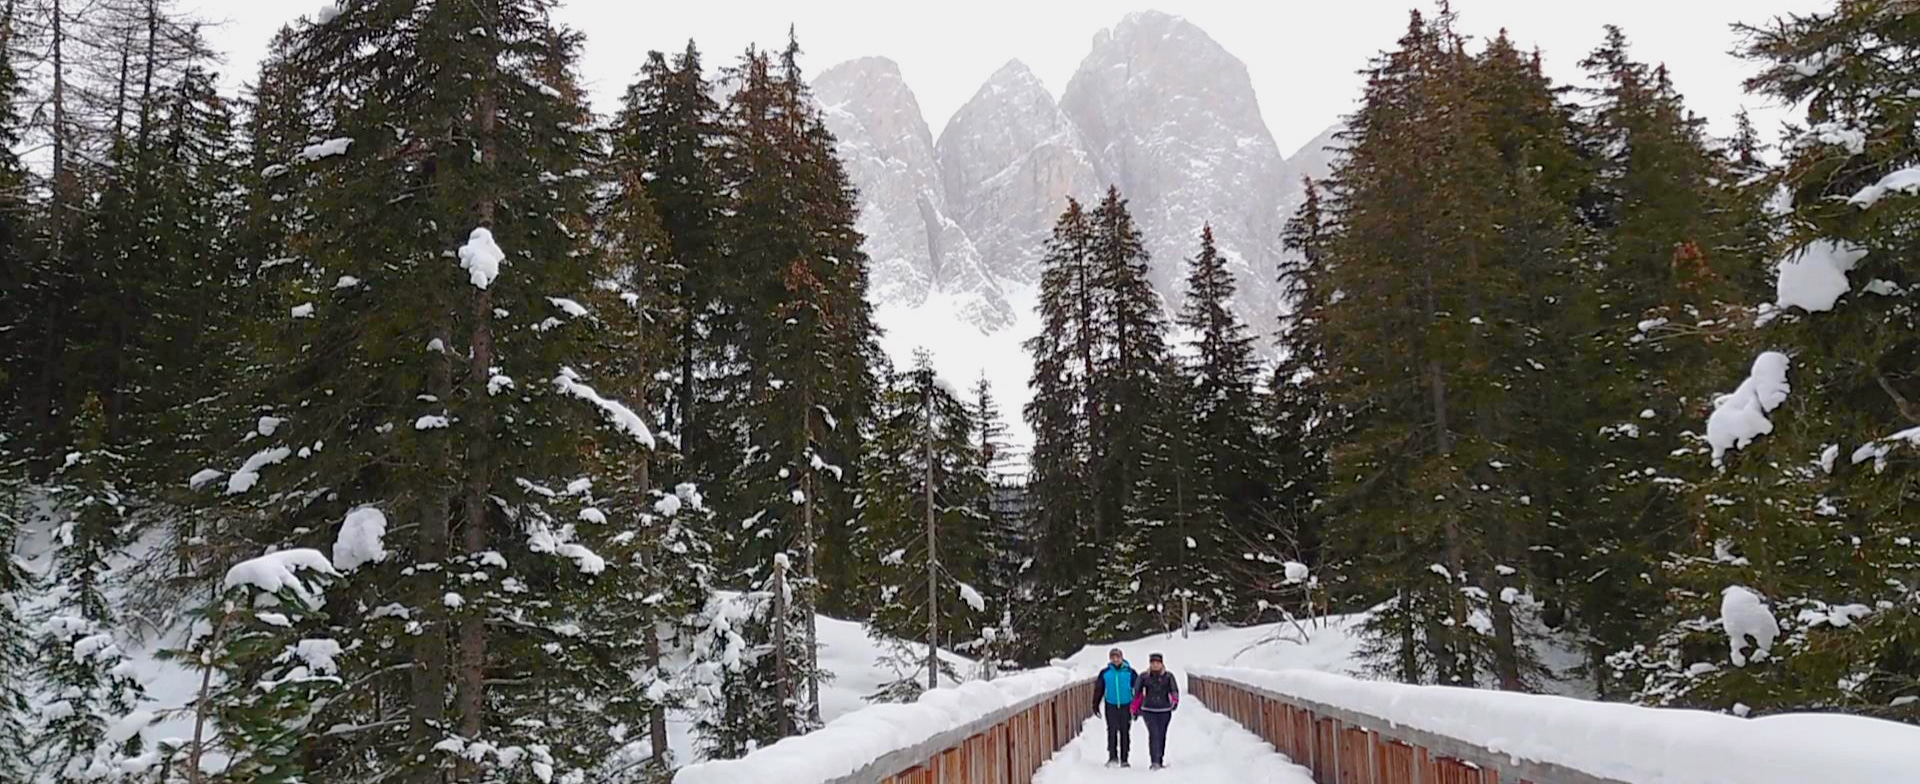 Naturerlebnisweg – Villnösser Alm - Villnössertal - Almen in Südtirol – Winterwandern Eisacktal - I mog südtirol – Wandern in Südtirol